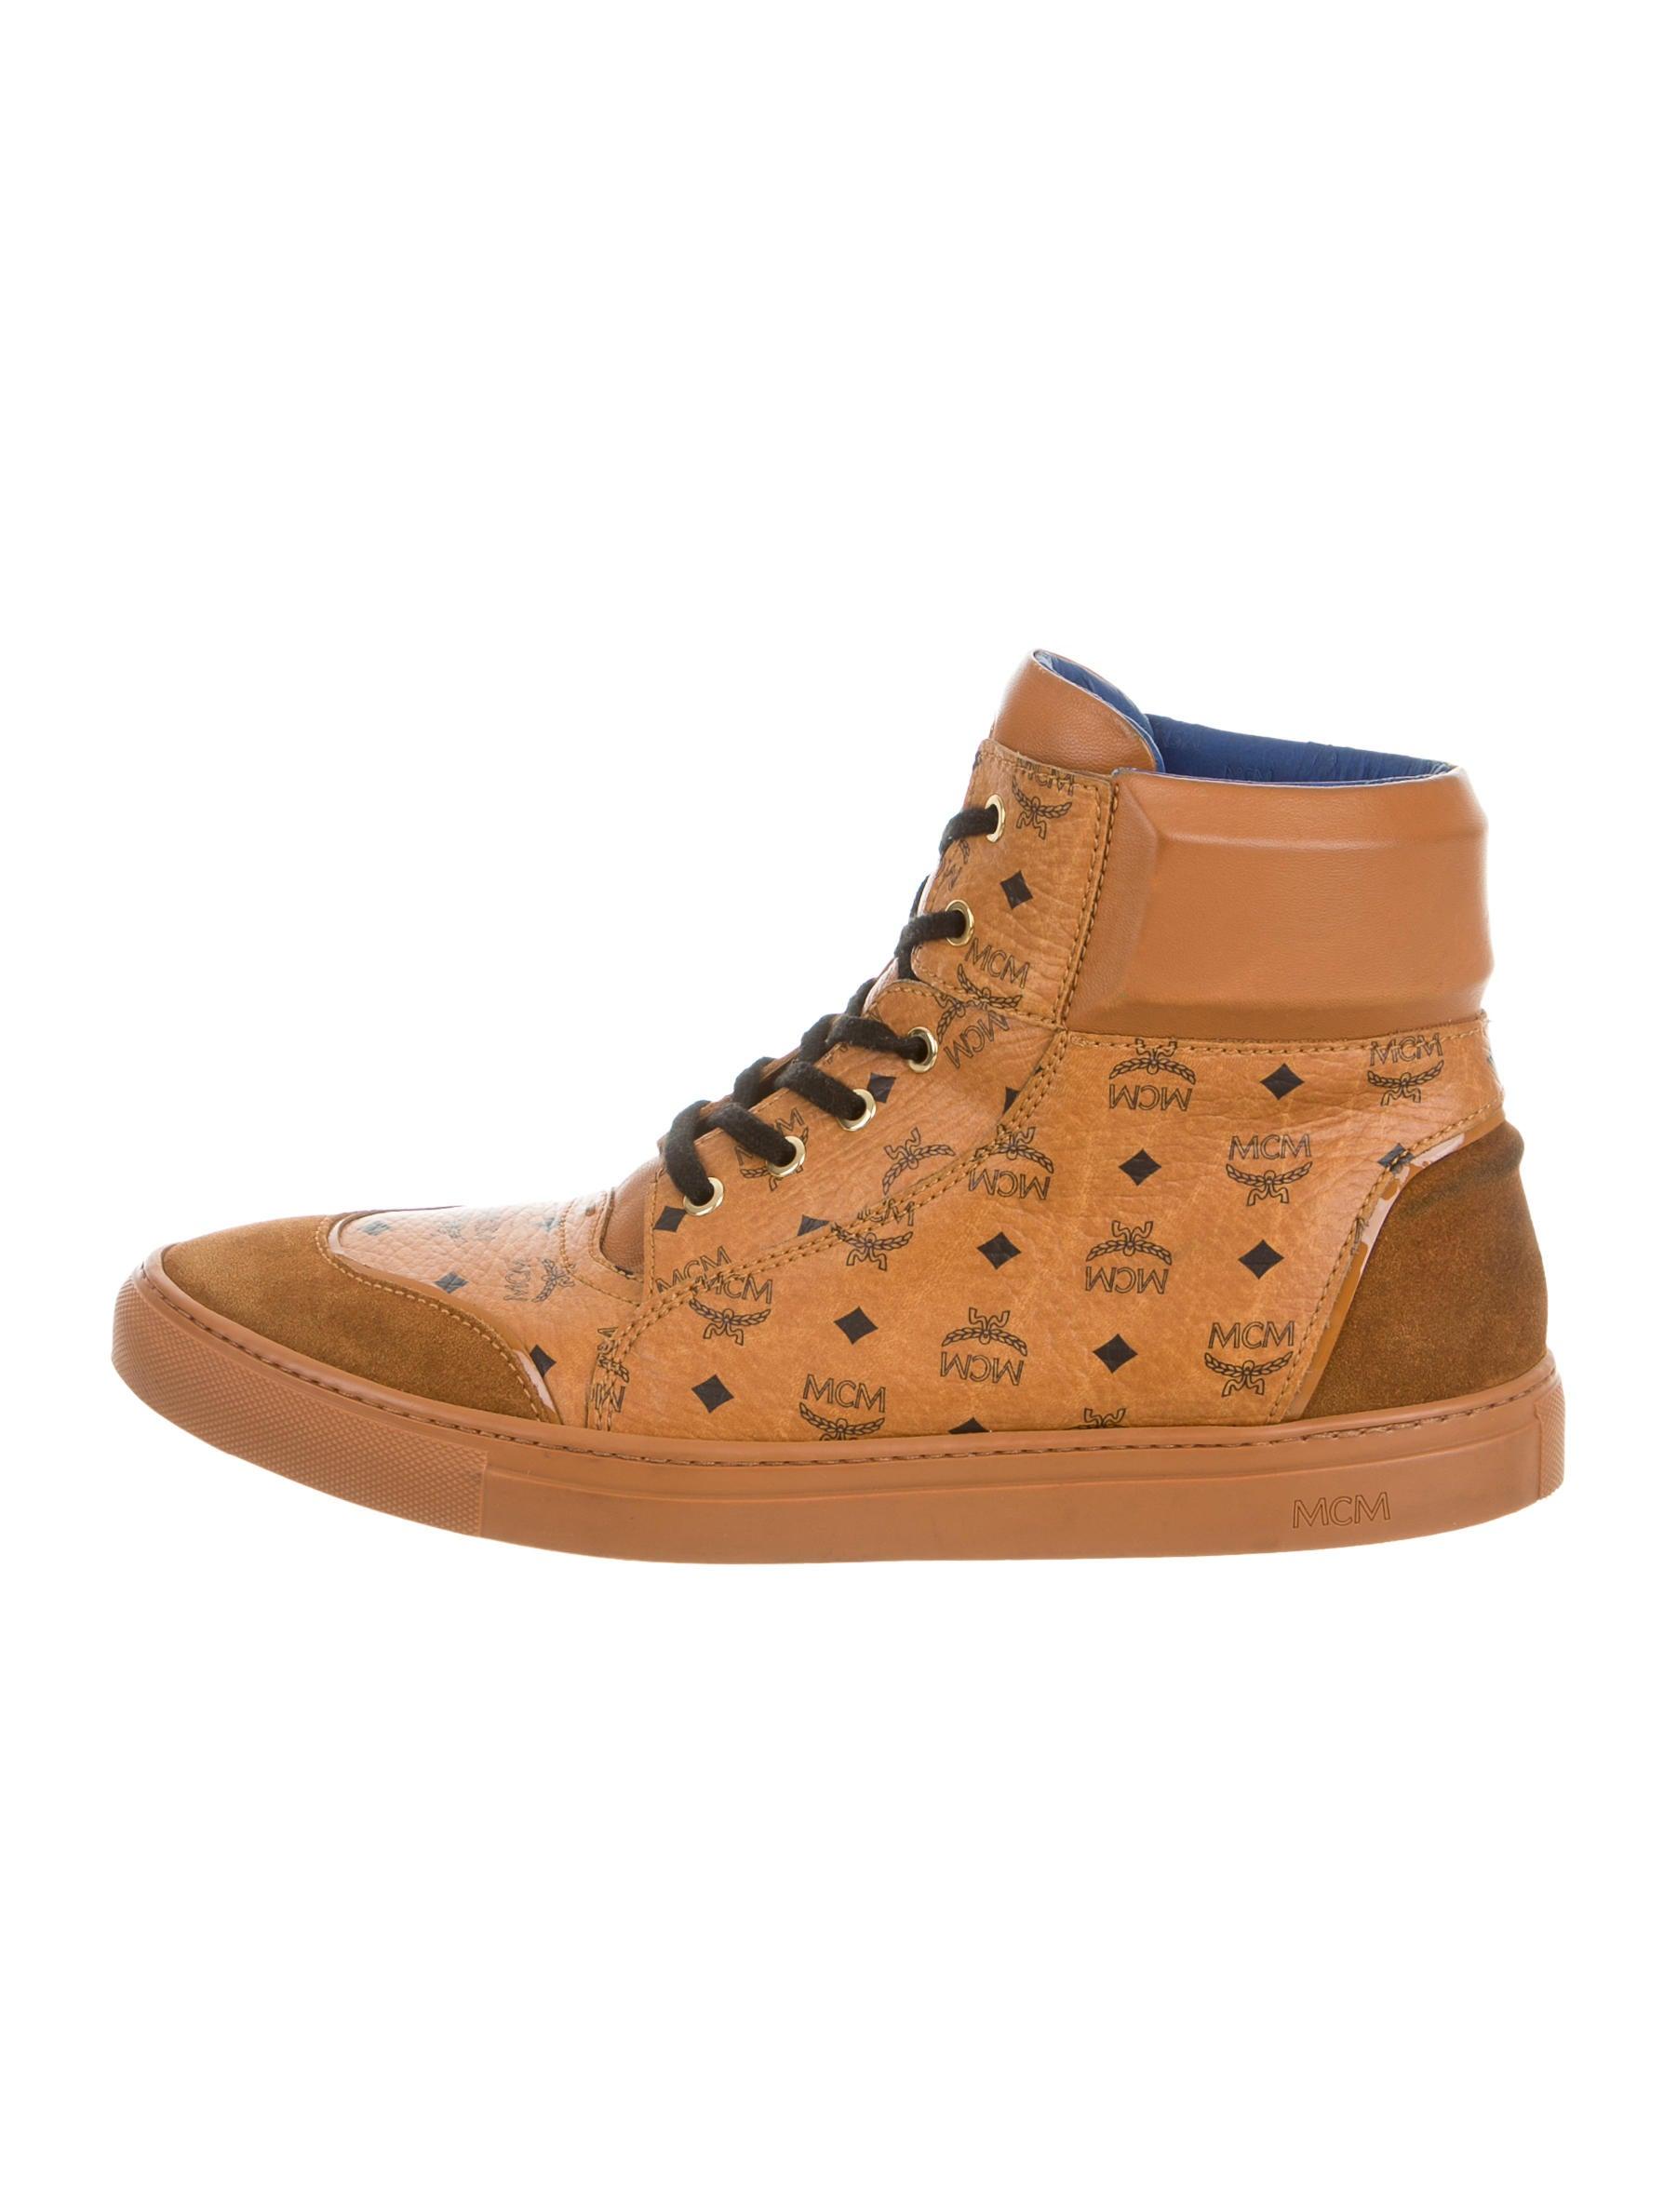 mcm sneakers sale 28 images mcm shoes for sale mcm wallet mcm sneakers sale new mcm 33 mcm. Black Bedroom Furniture Sets. Home Design Ideas